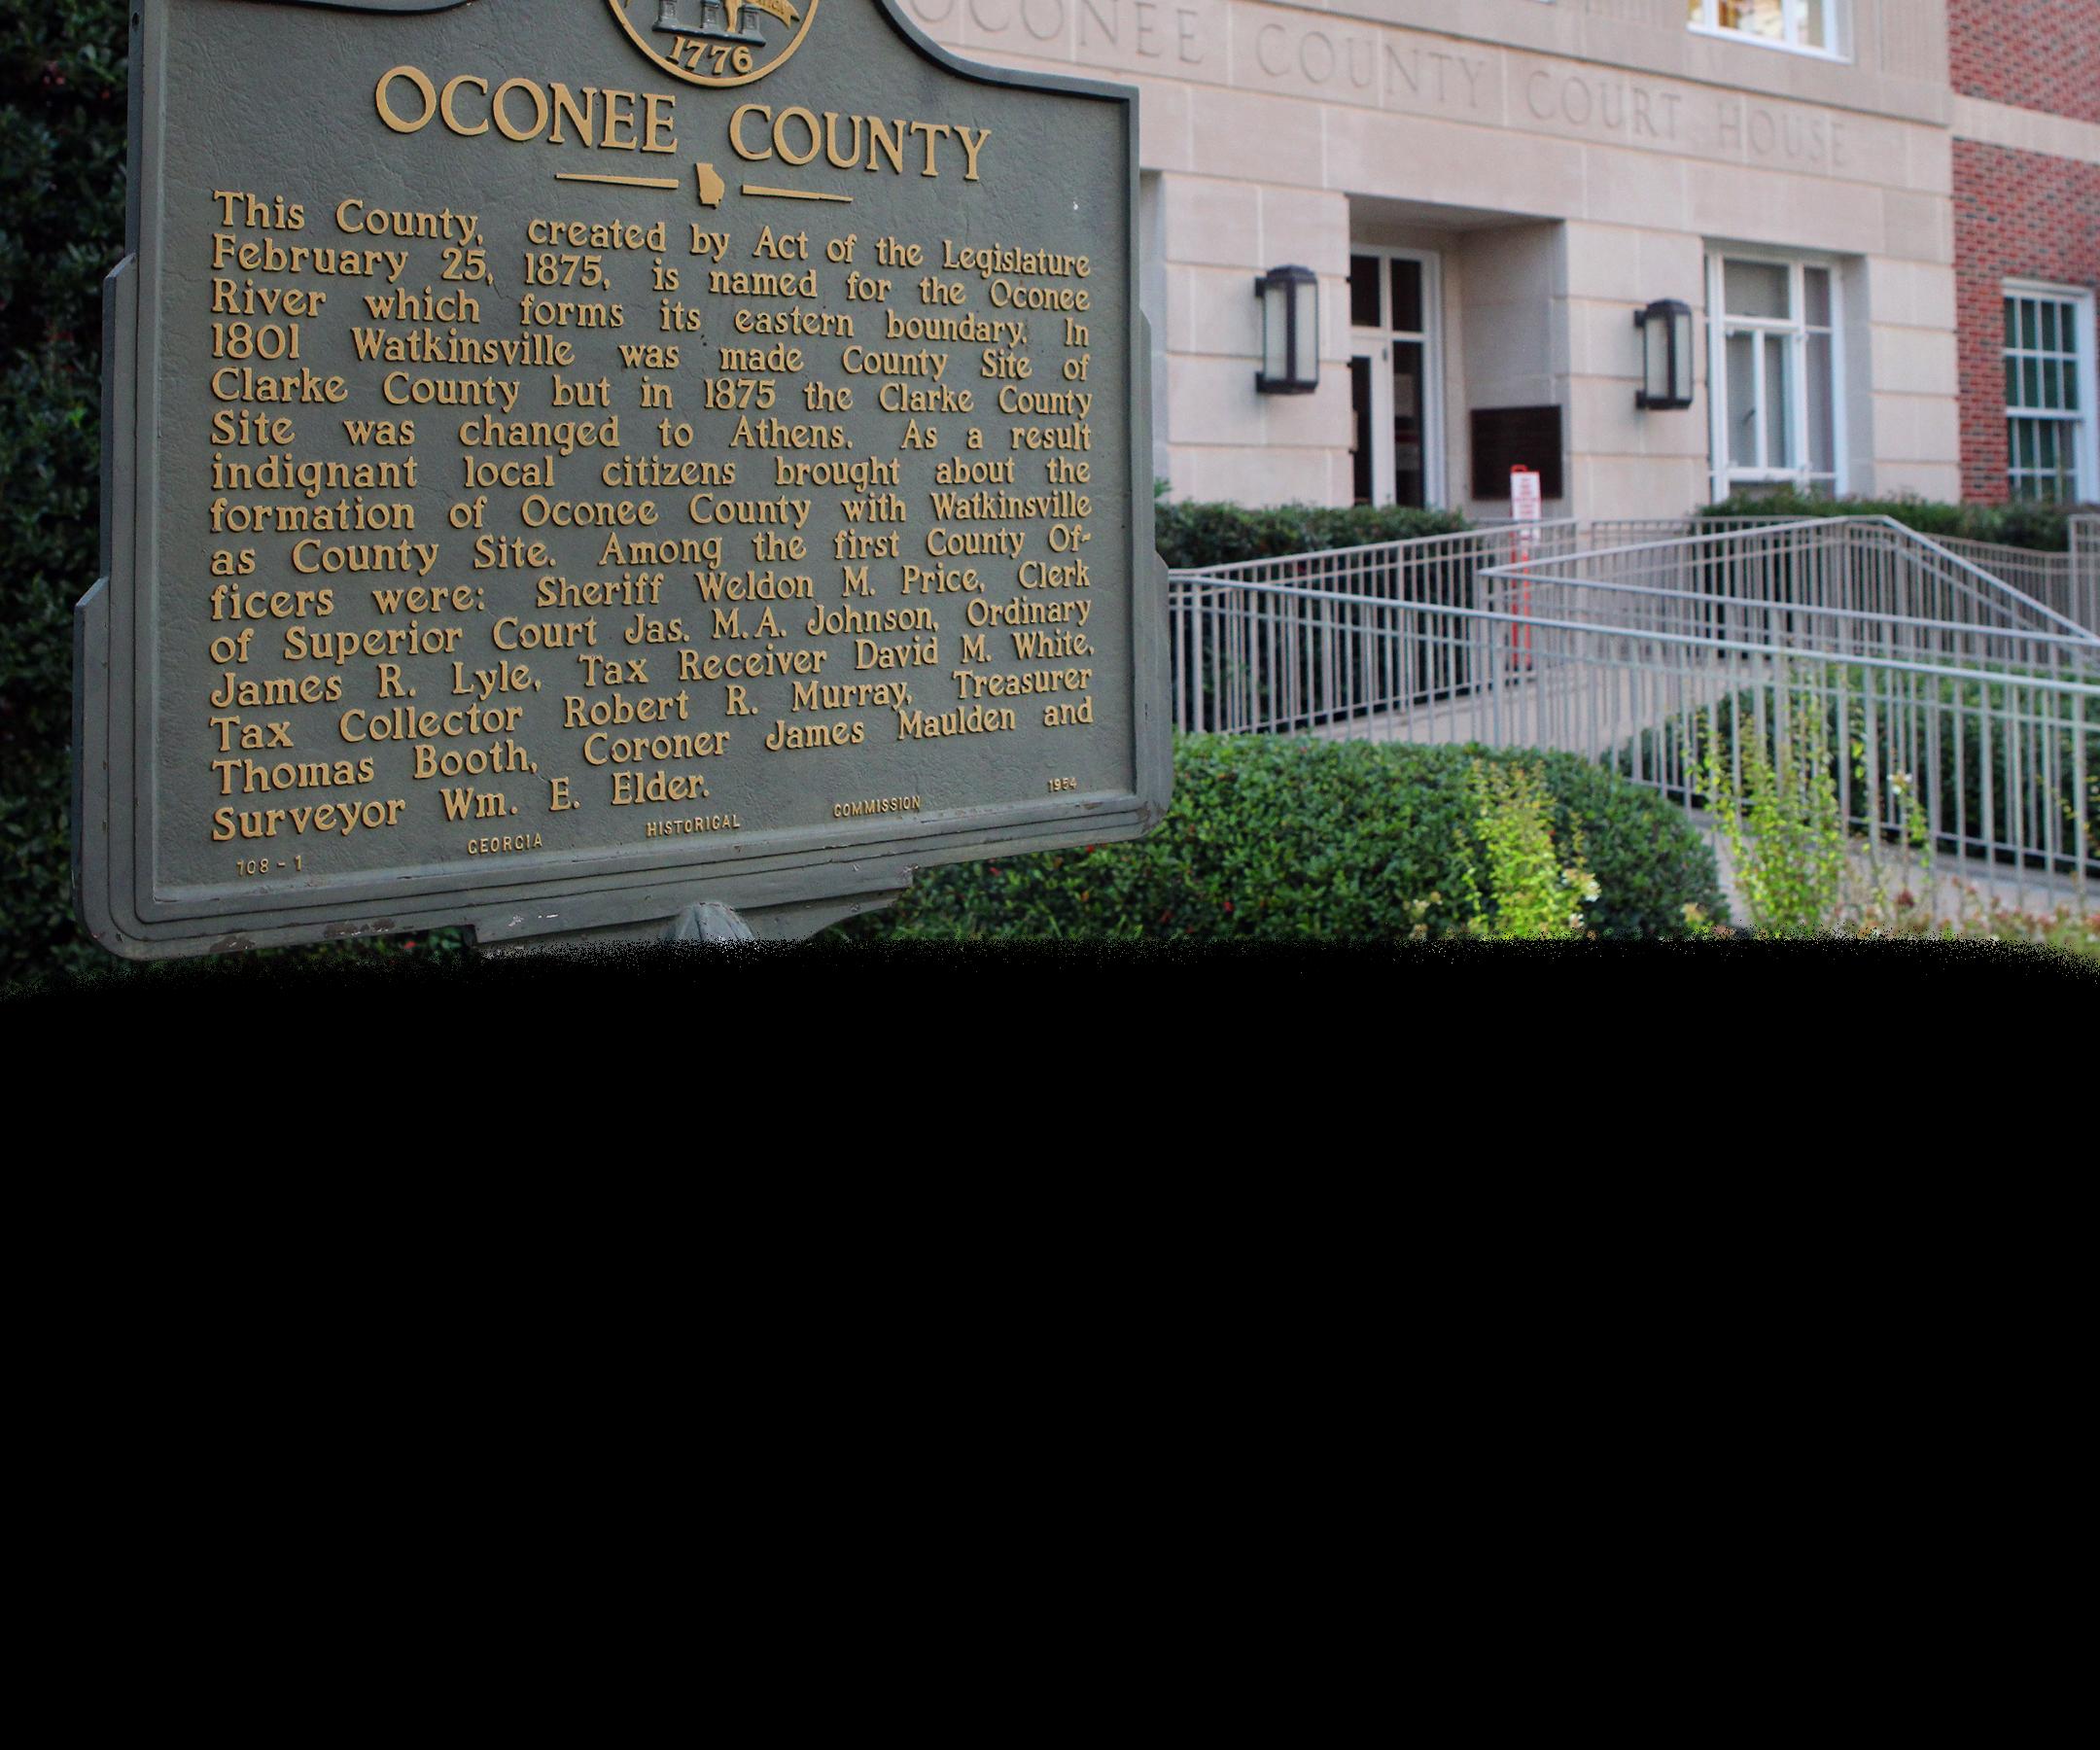 oconee county ga new bannerint